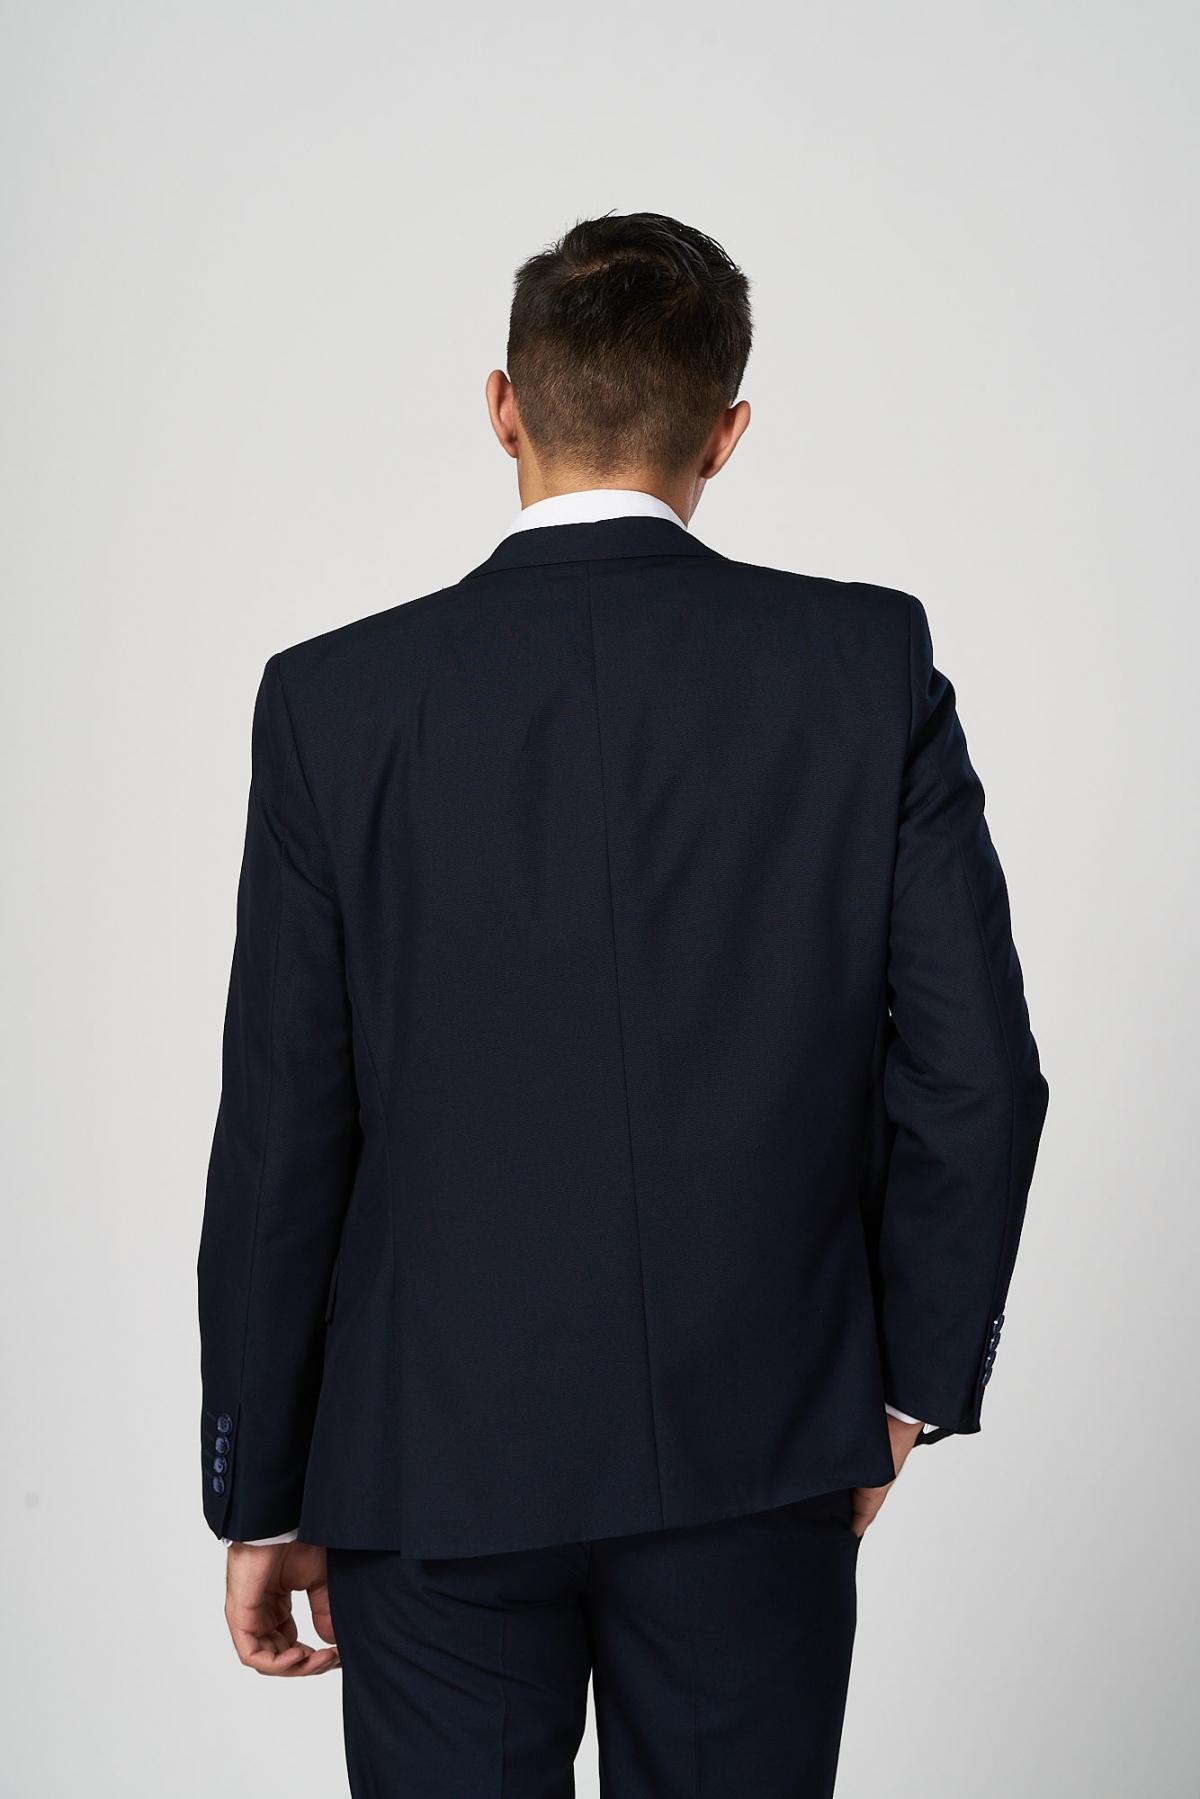 Costum clasic madotex cod: 1055